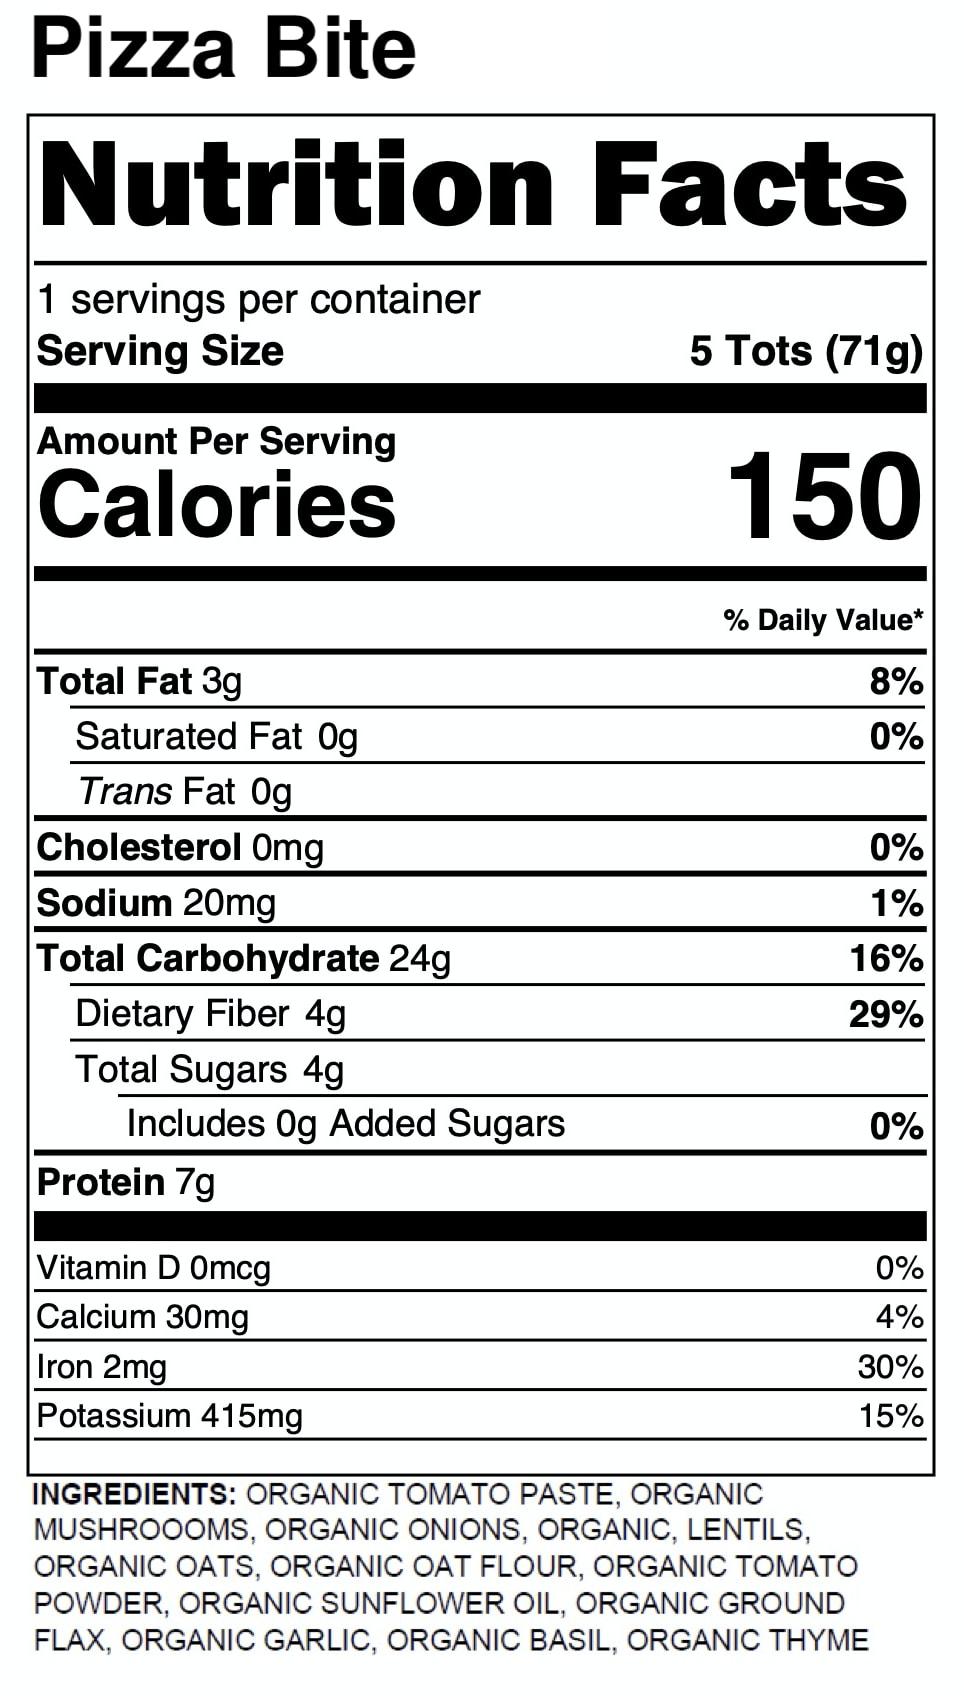 Yumi Pizza Bite nutrition facts